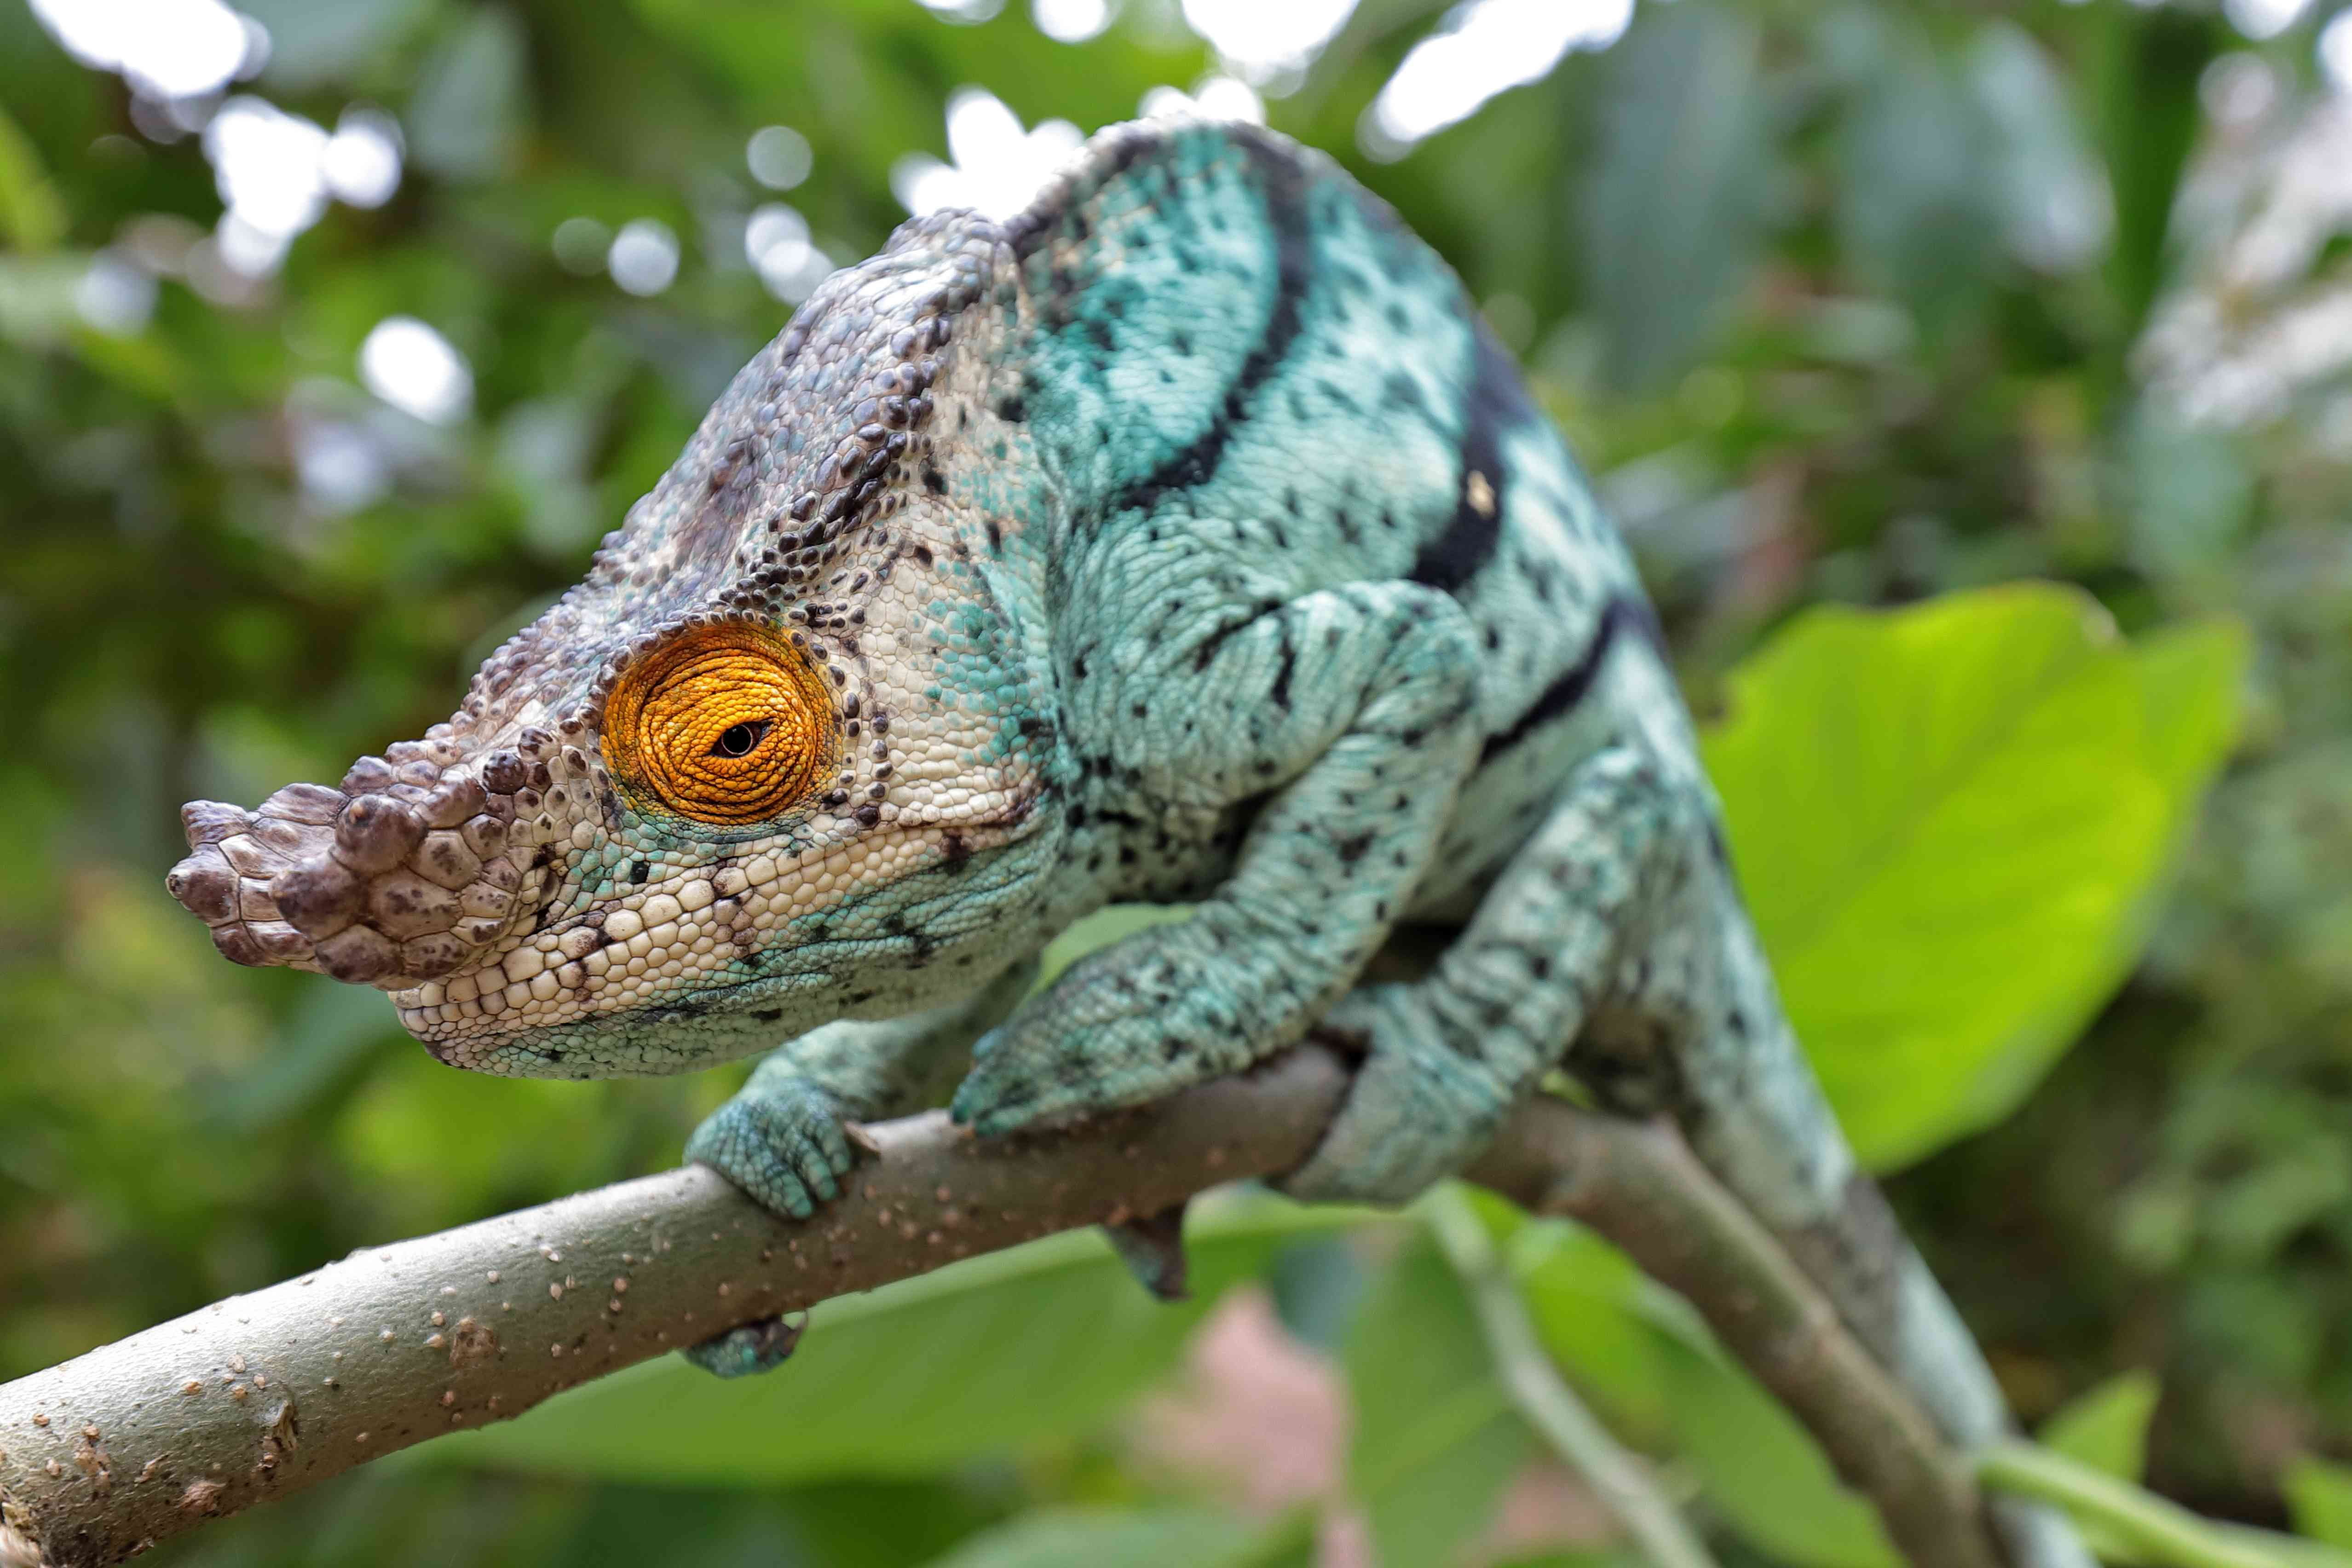 Male Parson's Chameleon